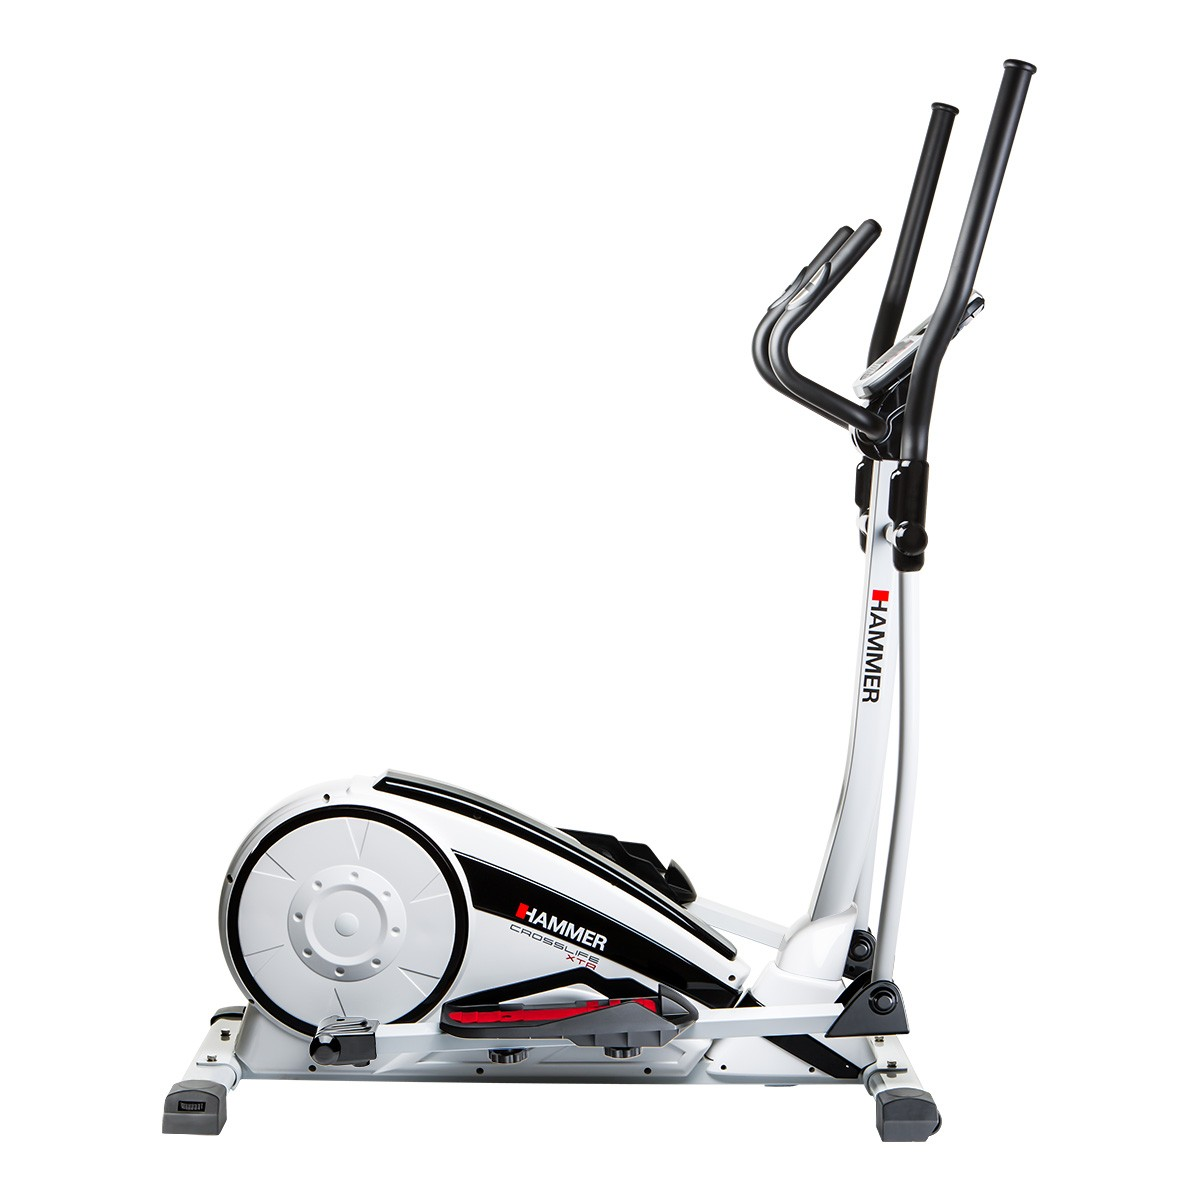 Hammer Ergometer Crosstrainer Crosslife BT Cardio Fitness Training Fitness & Jogging